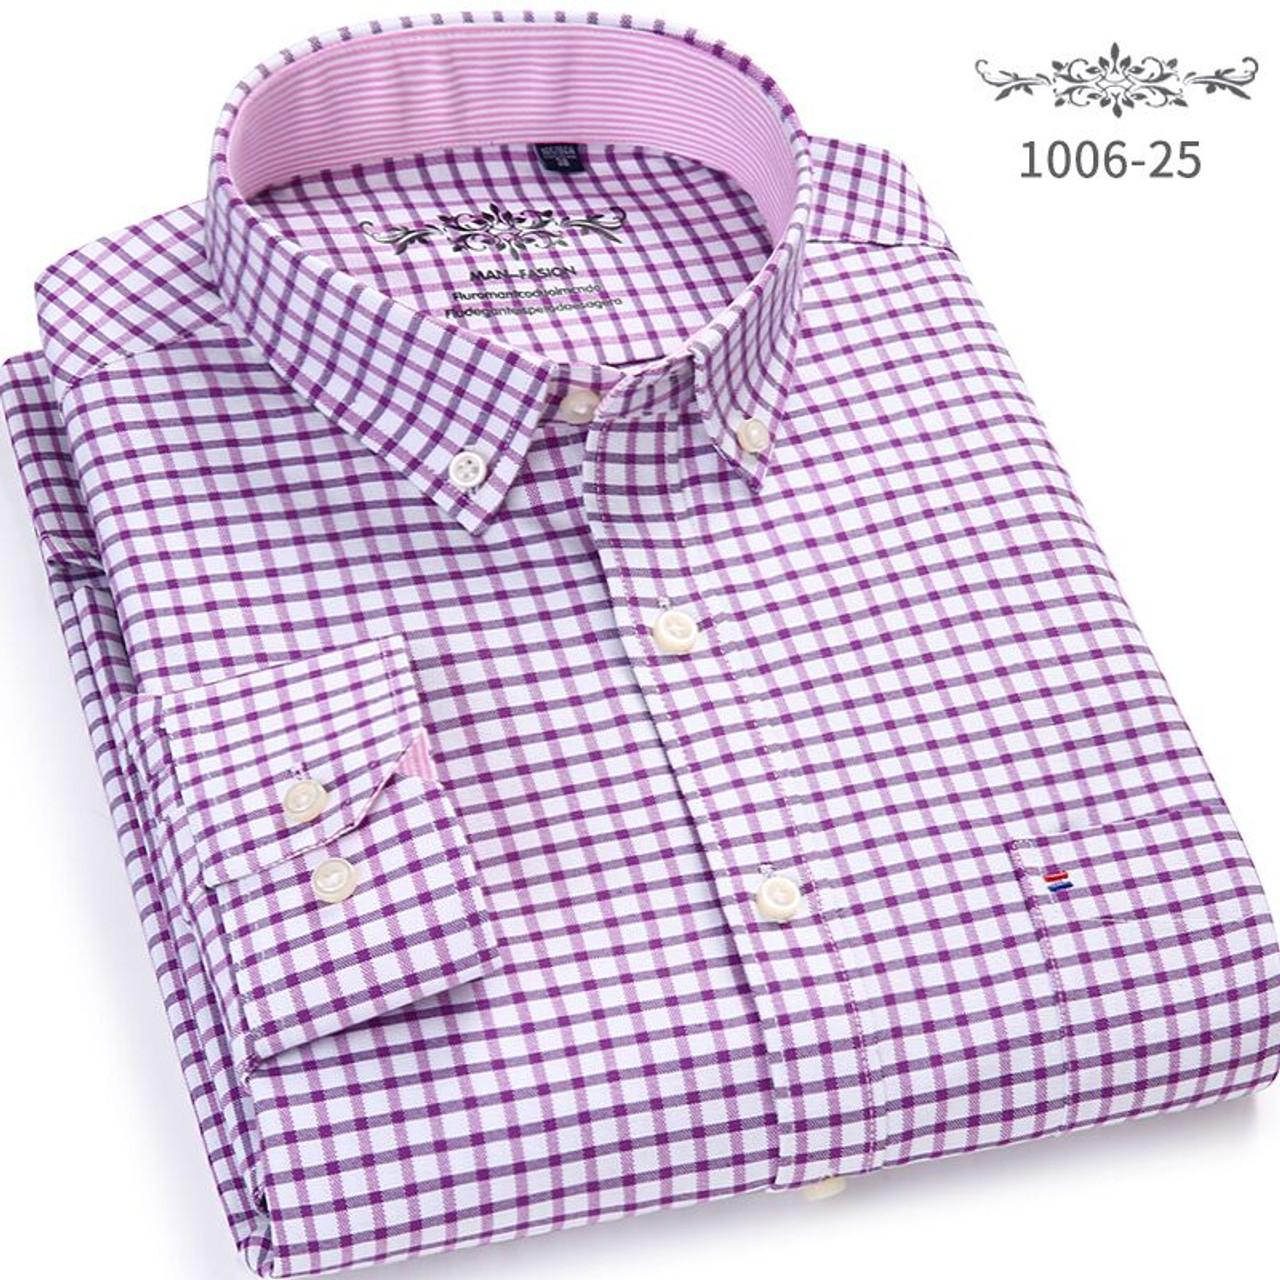 926f8e0df90 ... Men Shirt Long Sleeve Regular Fit men Plaid  amp  Striped Shirt Oxford  Mens Dress Shirts ...